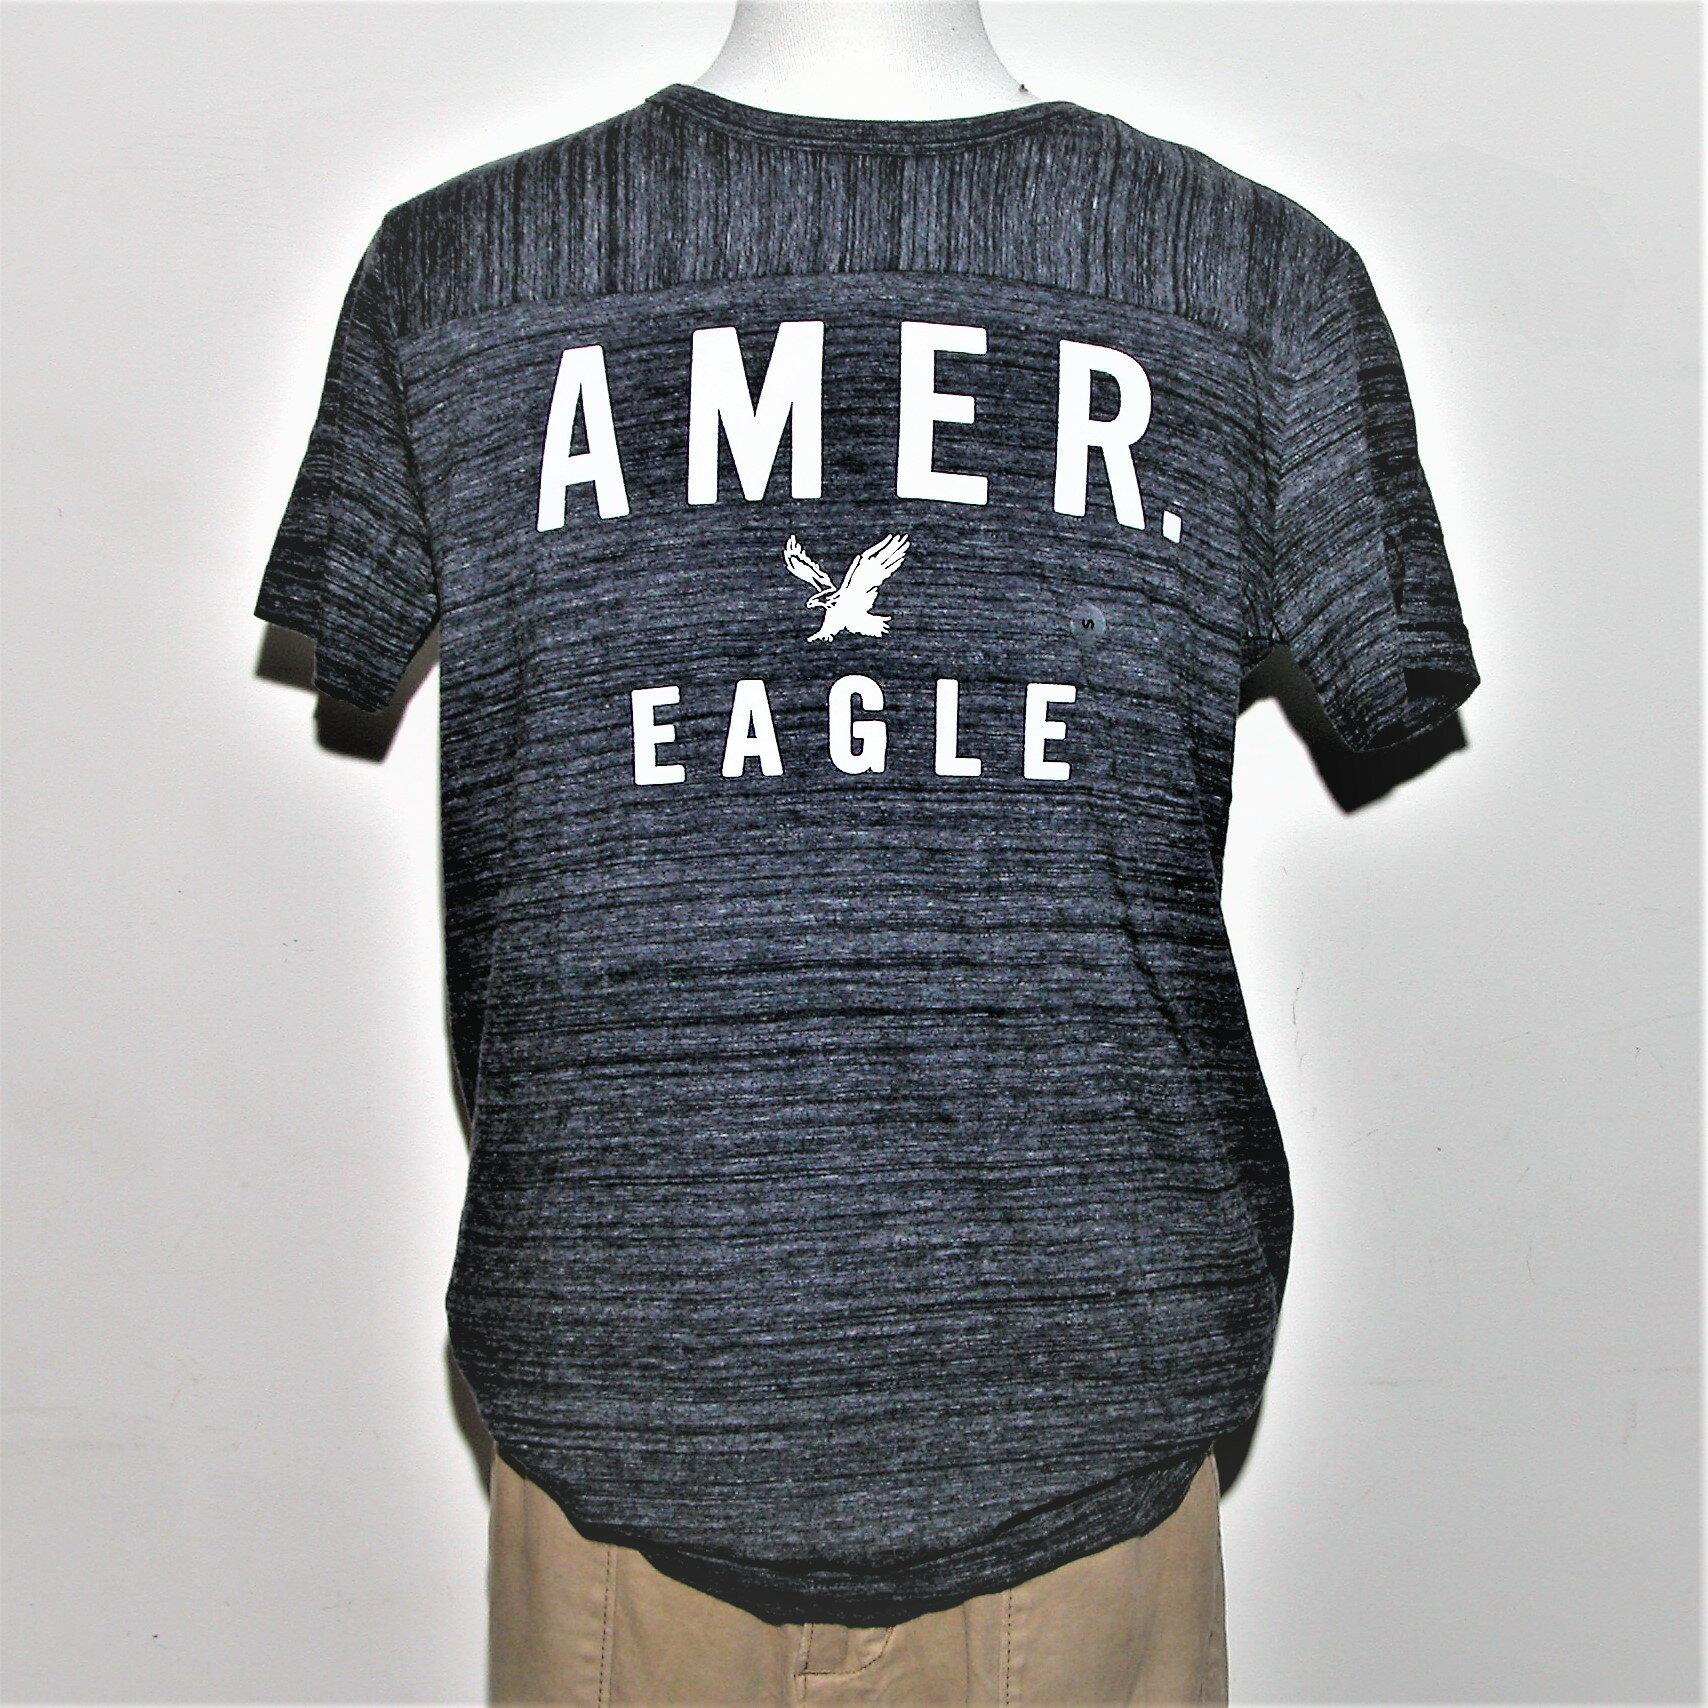 American Eagle 潮T,全新美國公司貨 【119 小鋪】